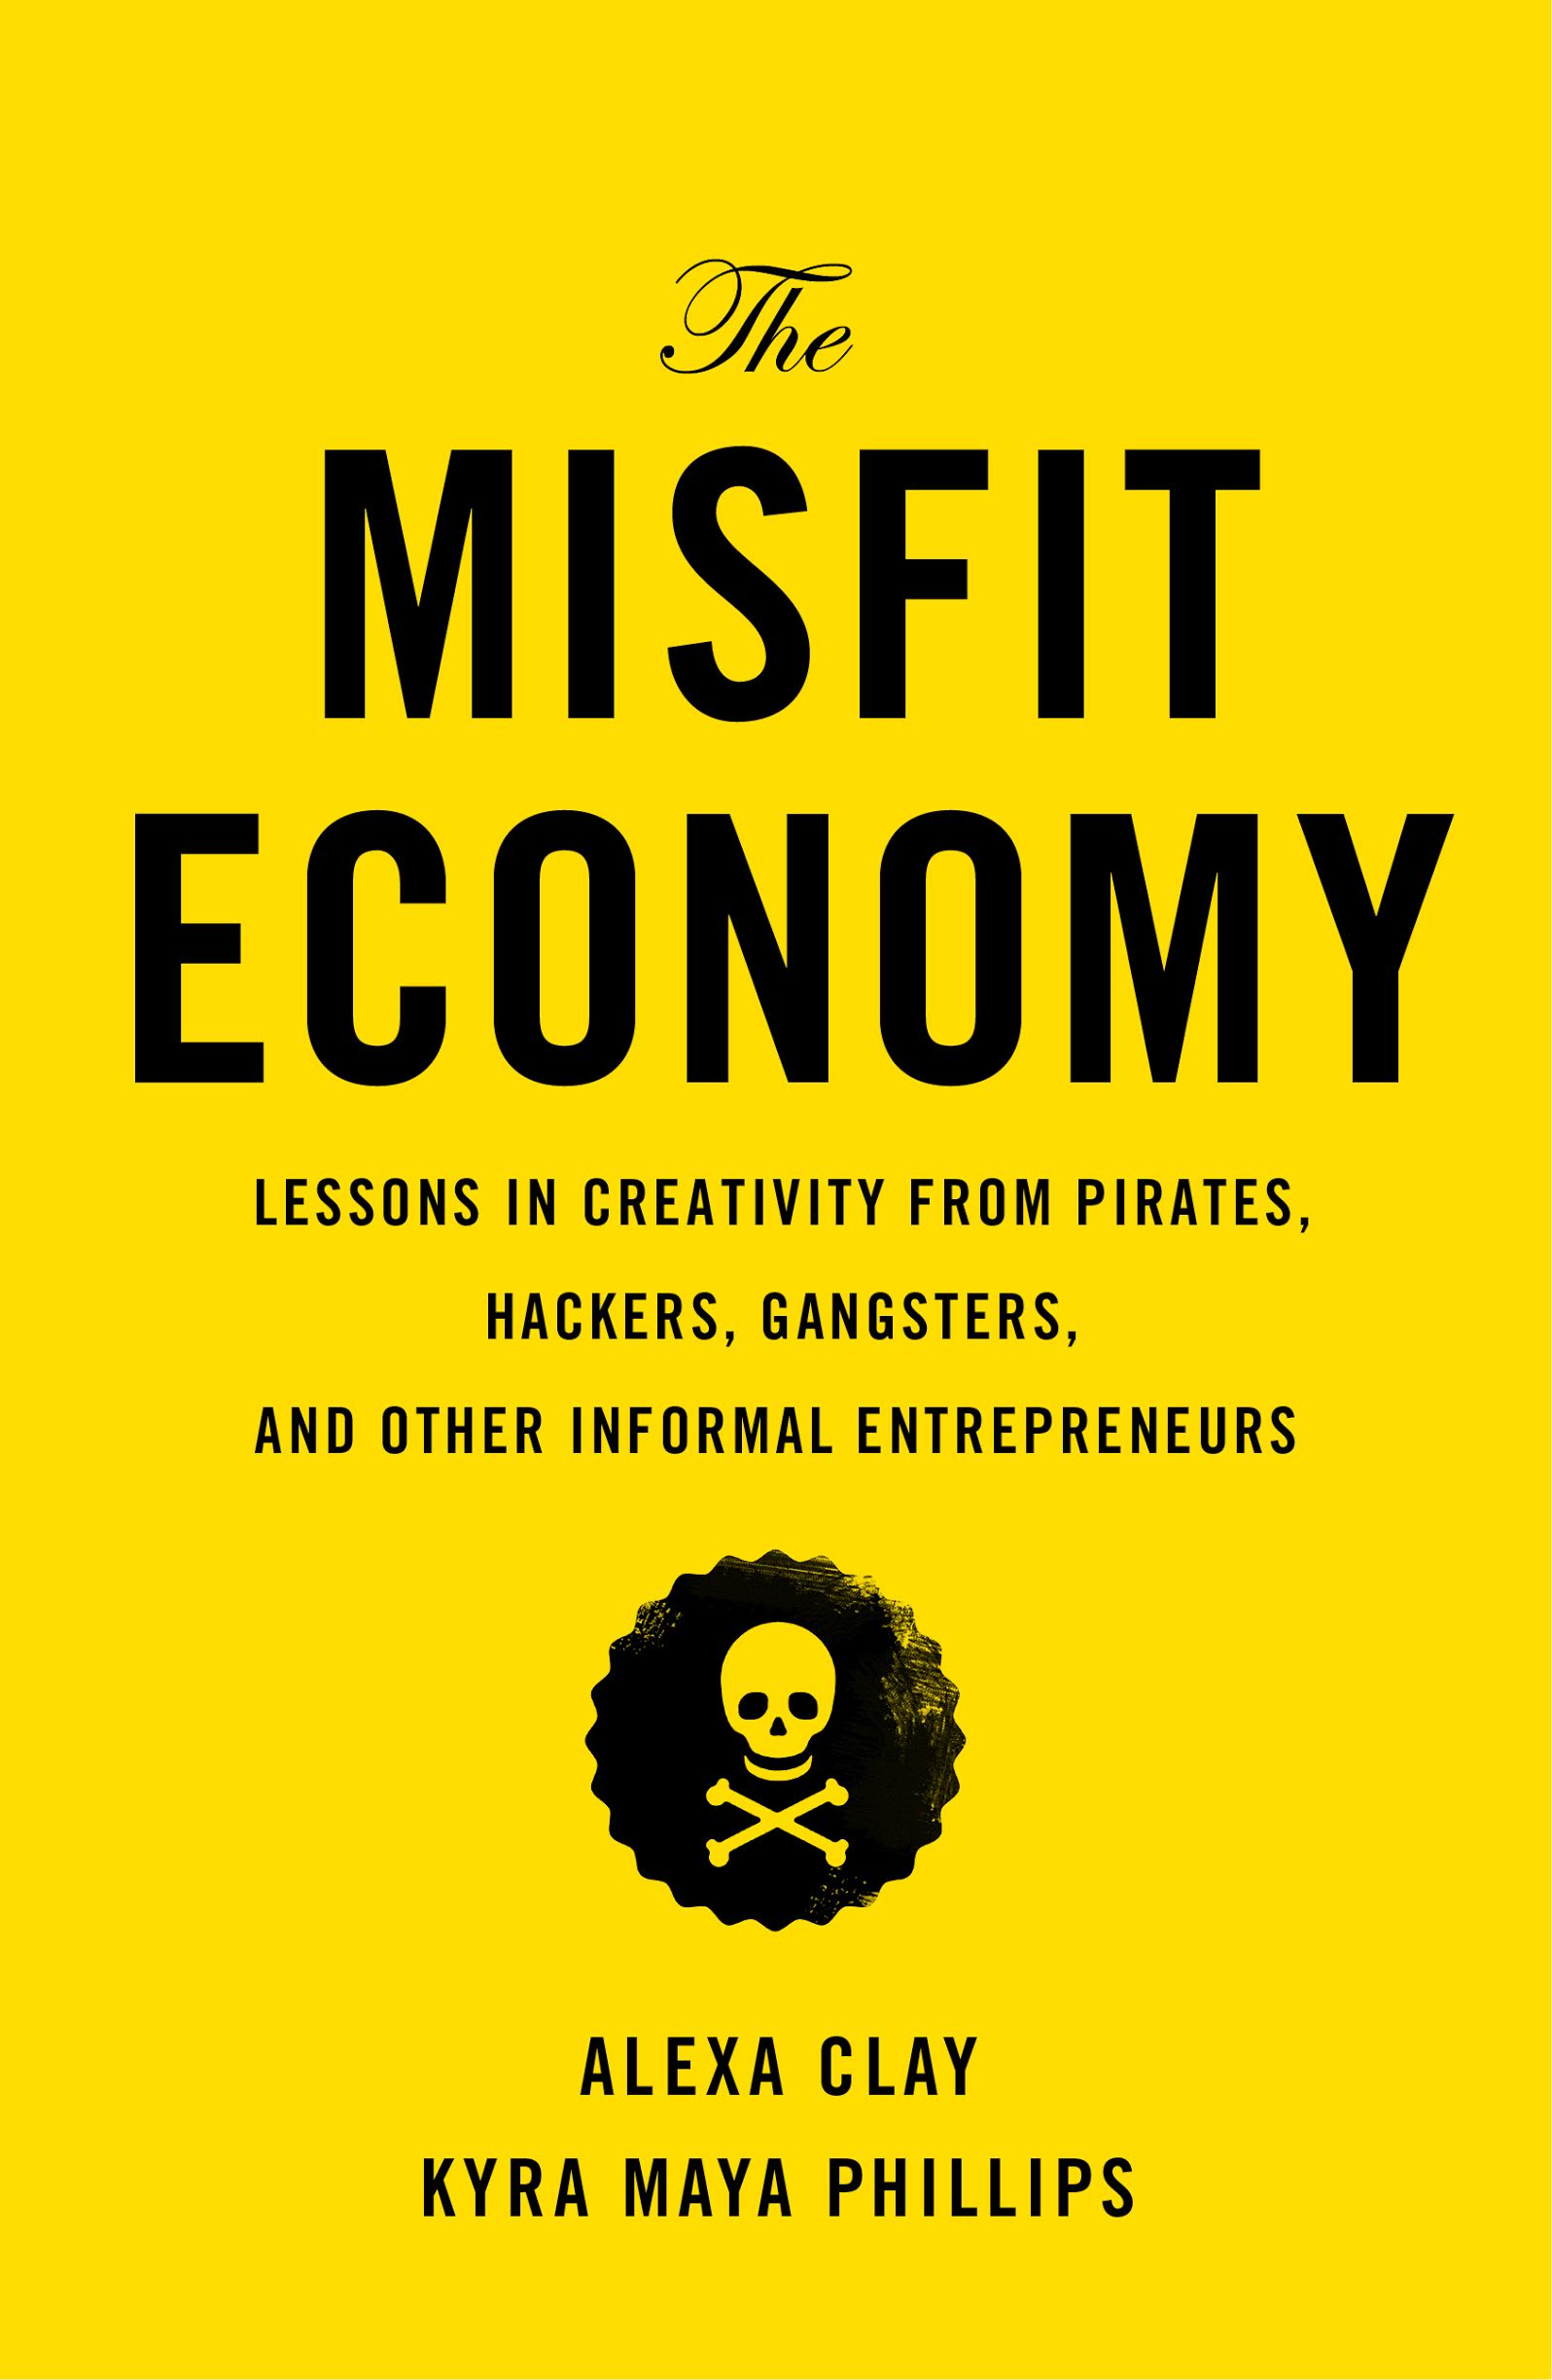 The Misfit Economy Book Review | EmmaLouisa.com